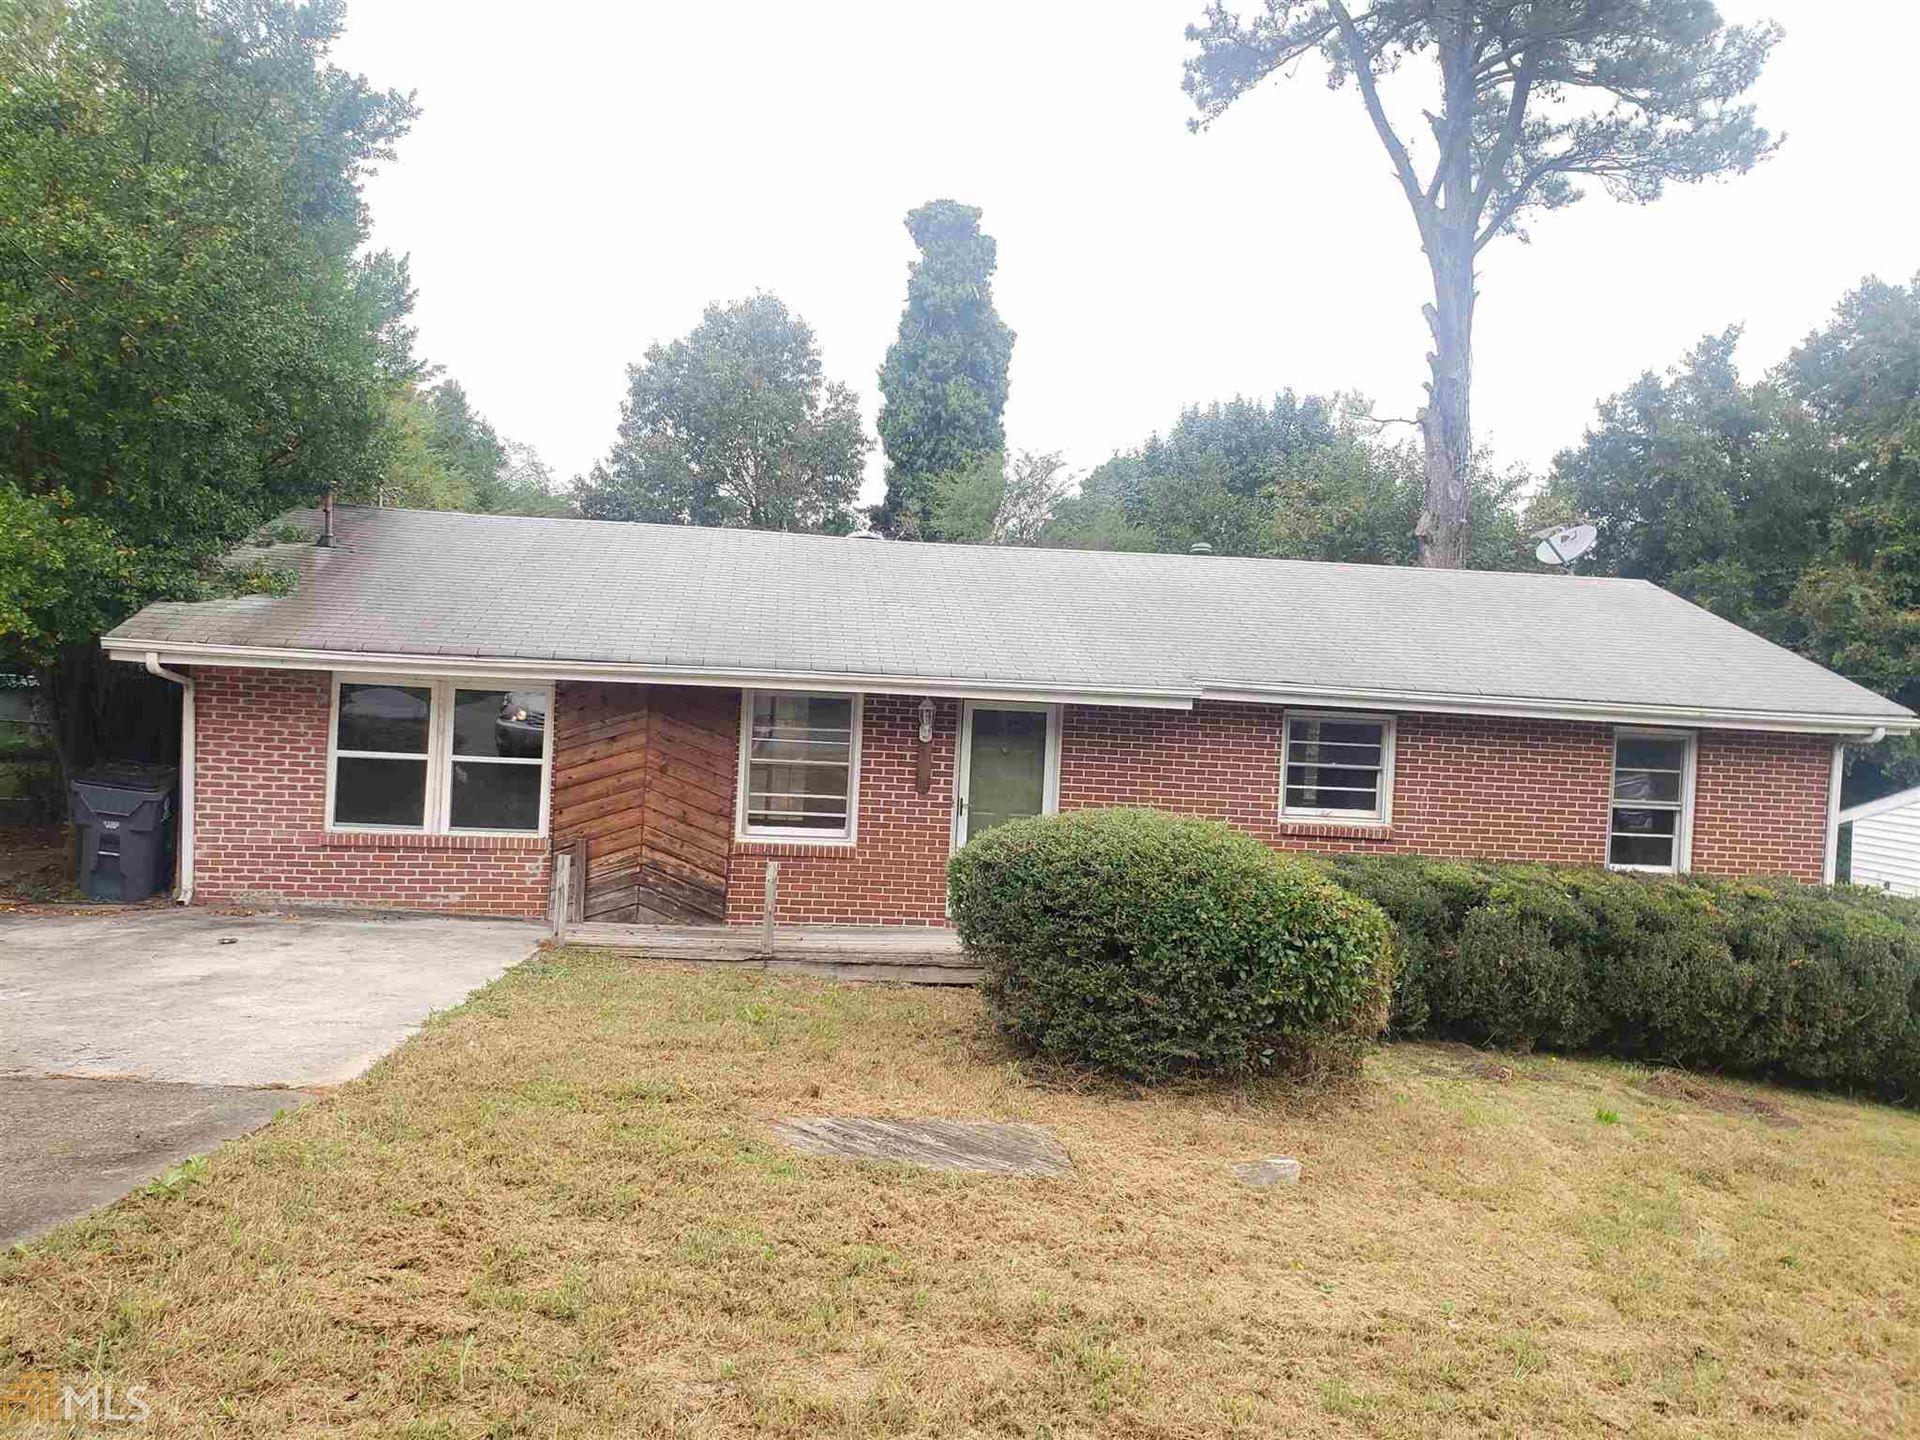 115 Woodhaven Dr, Stockbridge, GA 30281 - MLS#: 8871903